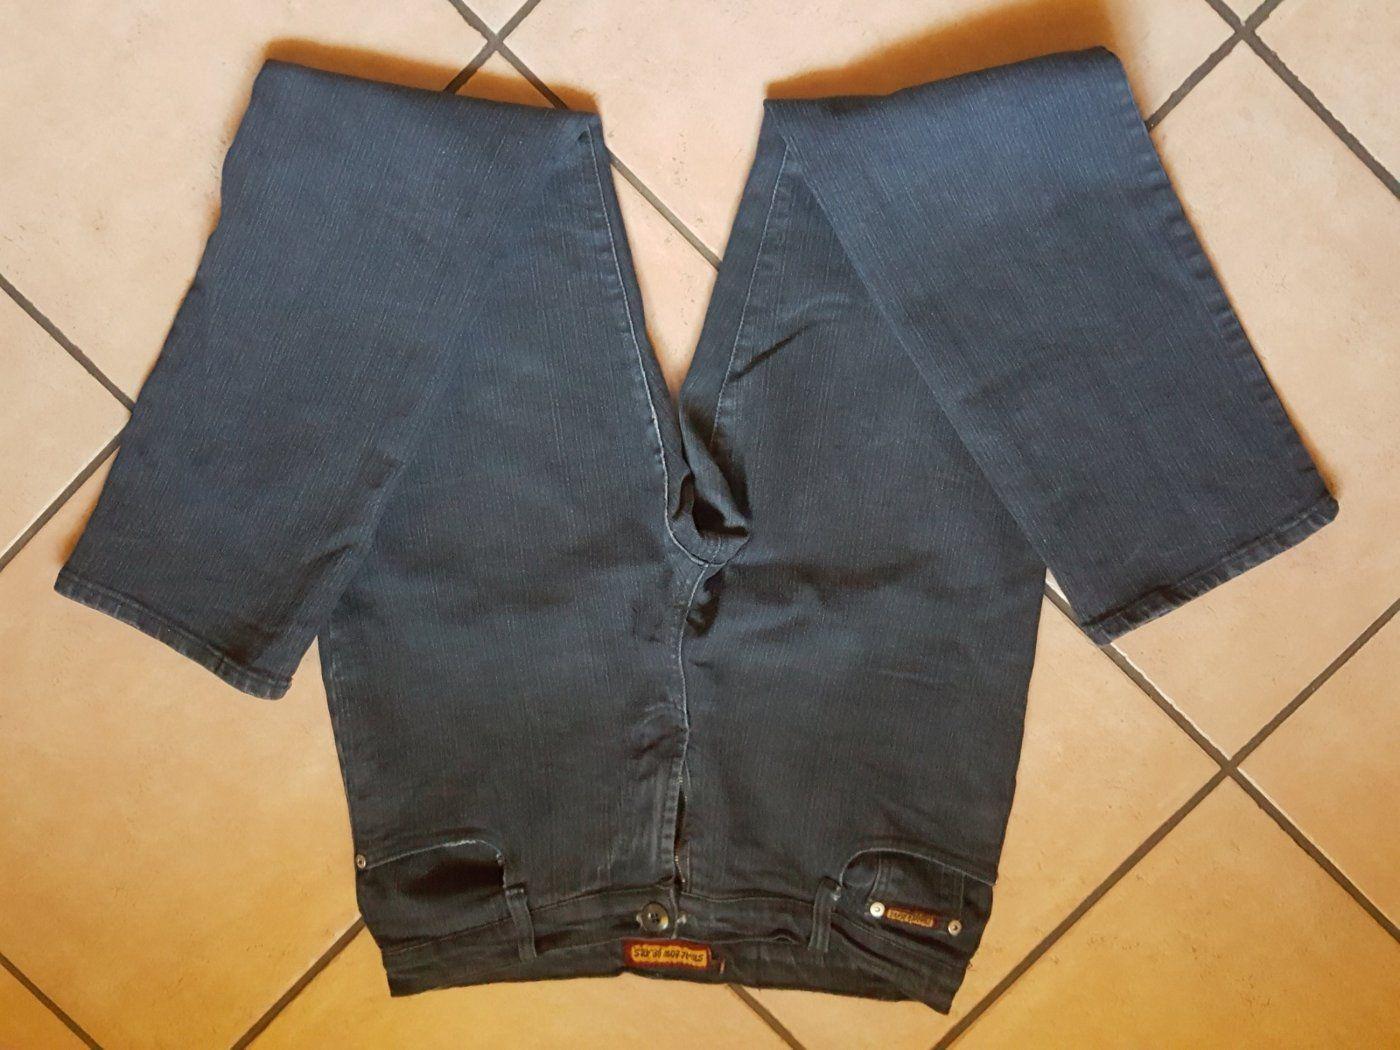 Jeans | Mädchenflohmarkt